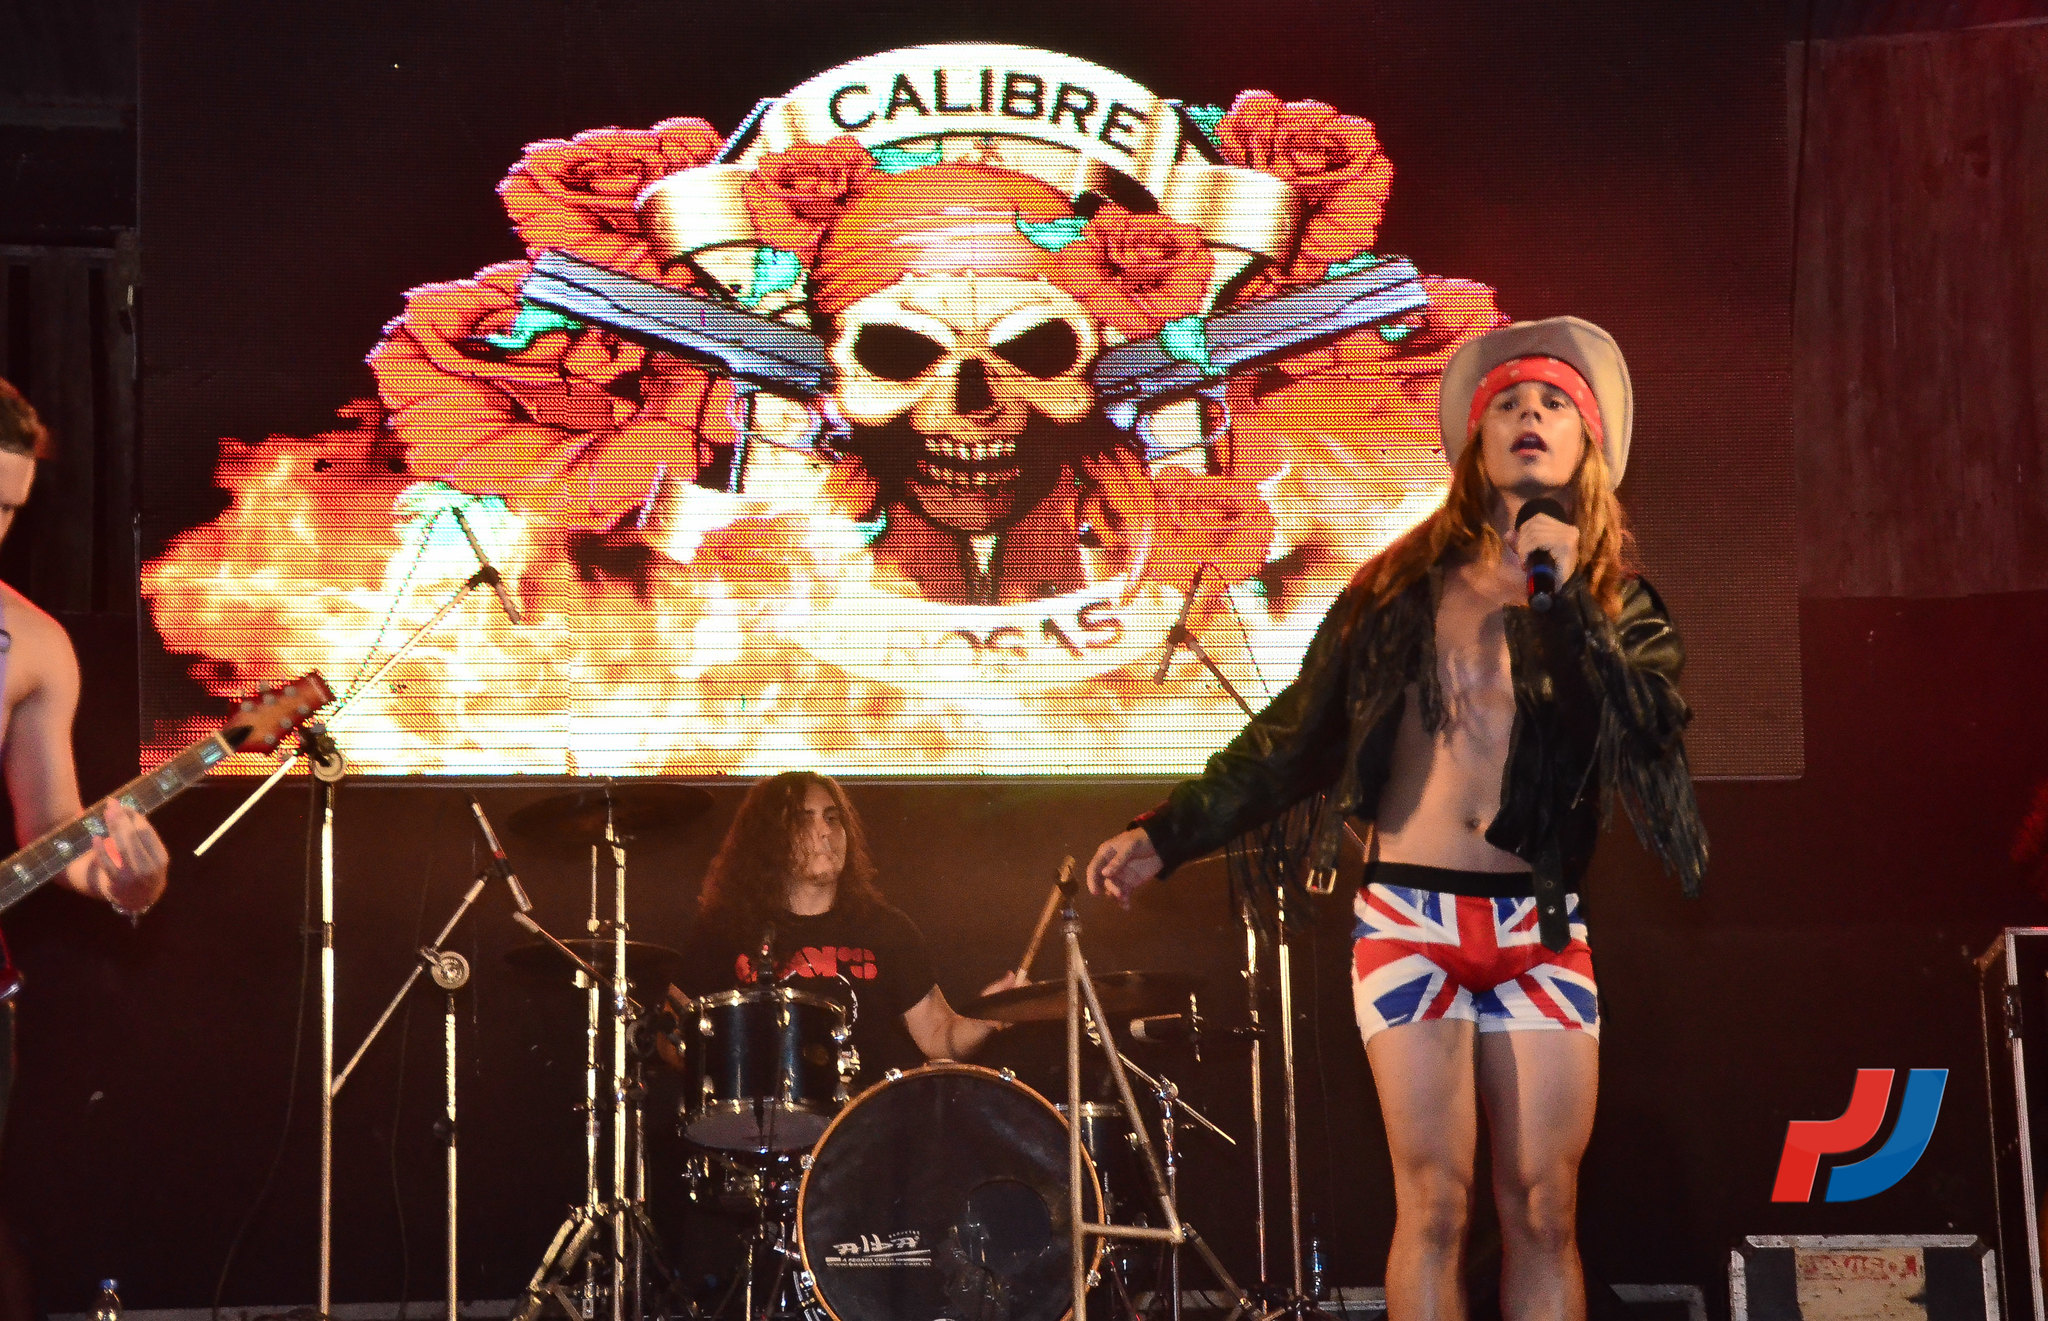 Banda Calibre de Rosas (Guns N' Roses Cover)